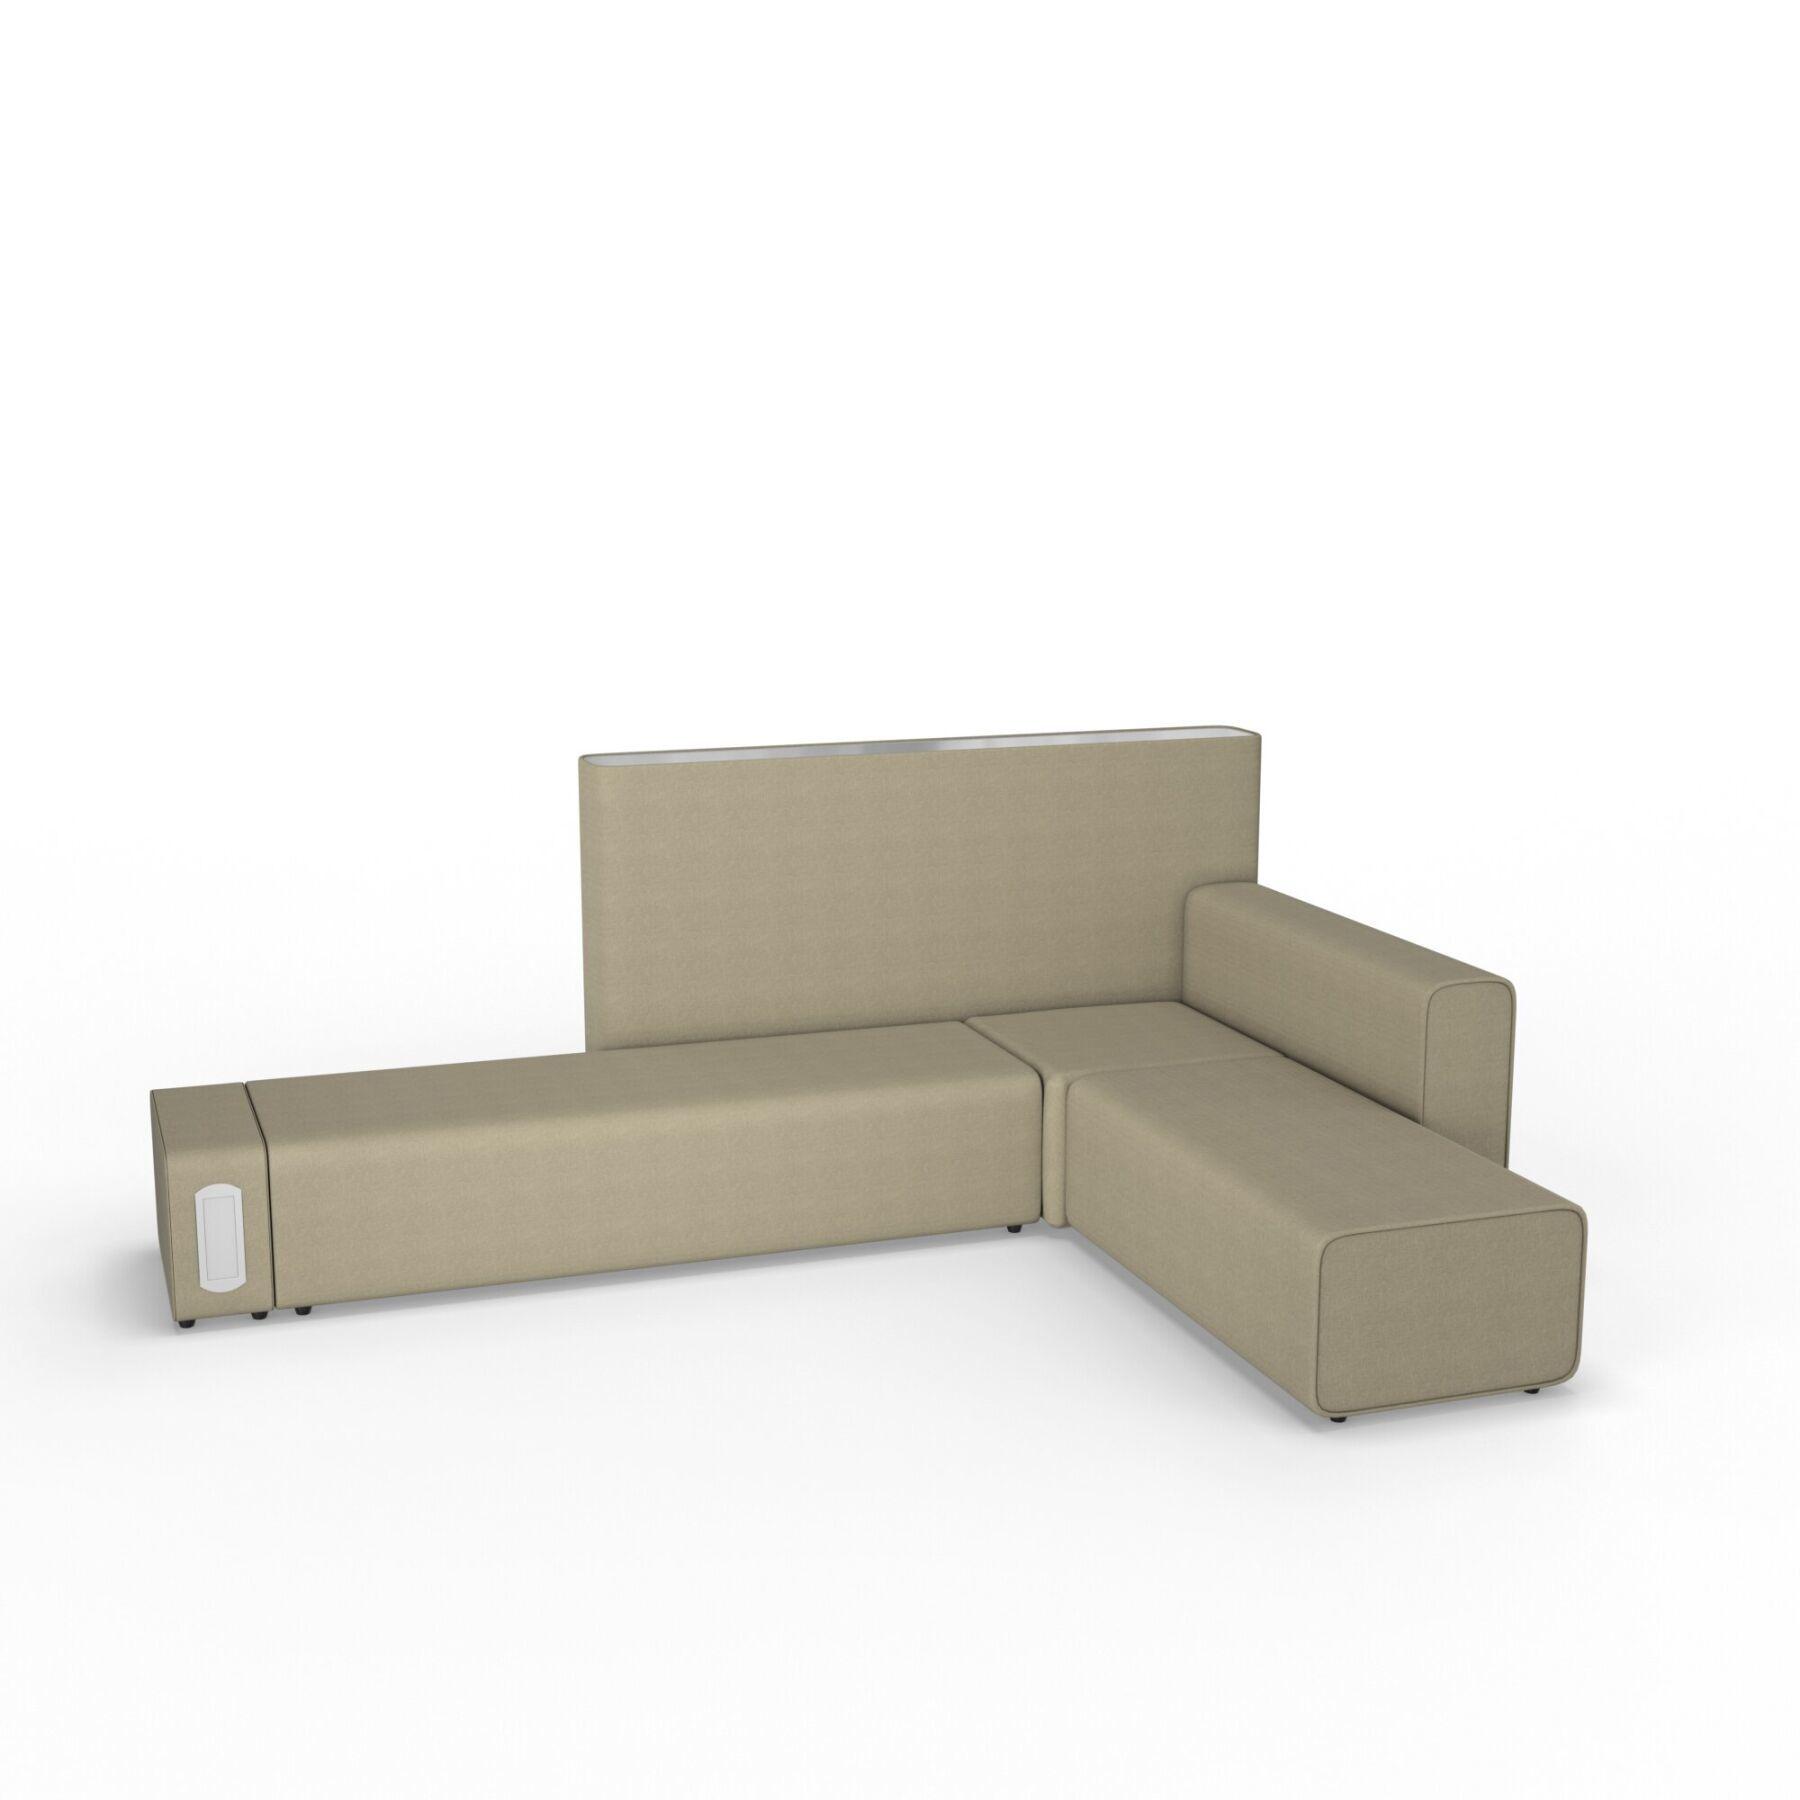 Шестиместный диван KULIK SYSTEM TUBER Ткань Целый